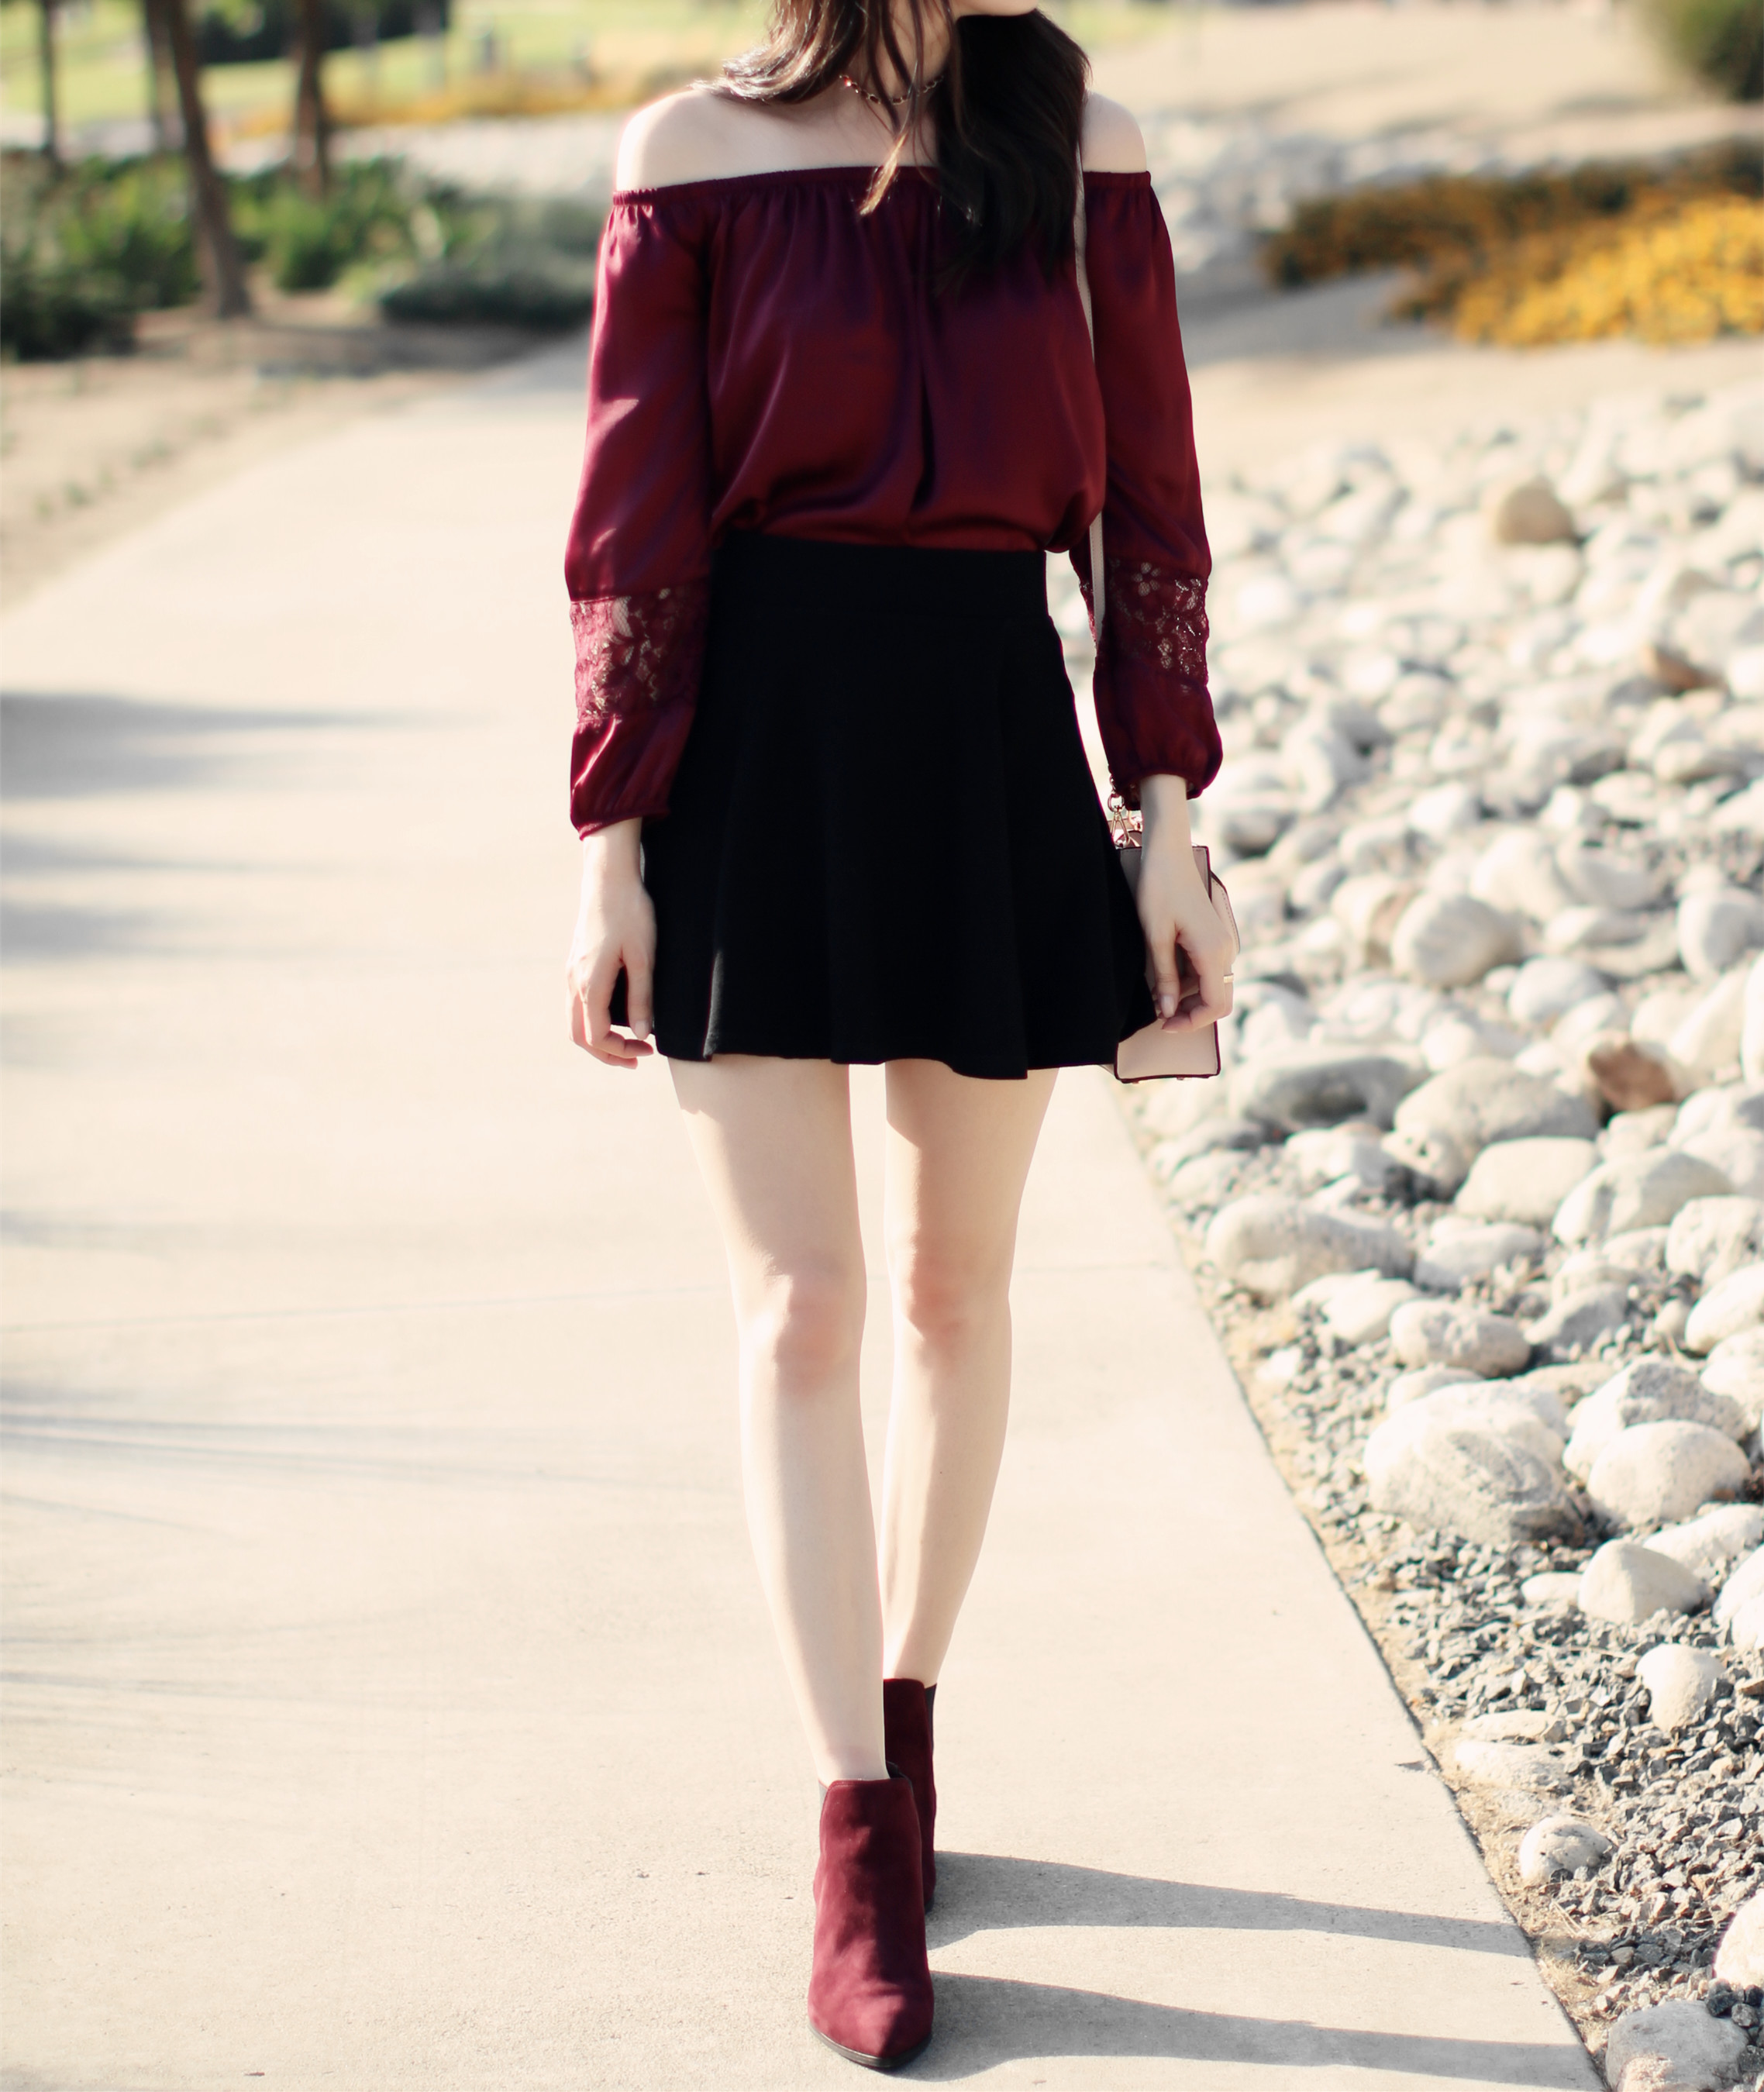 3598-ootd-fashion-style-outfitoftheday-wiwt-silk-lace-fallfashion-forever21-f21xme-elizabeeetht-clothestoyouuu